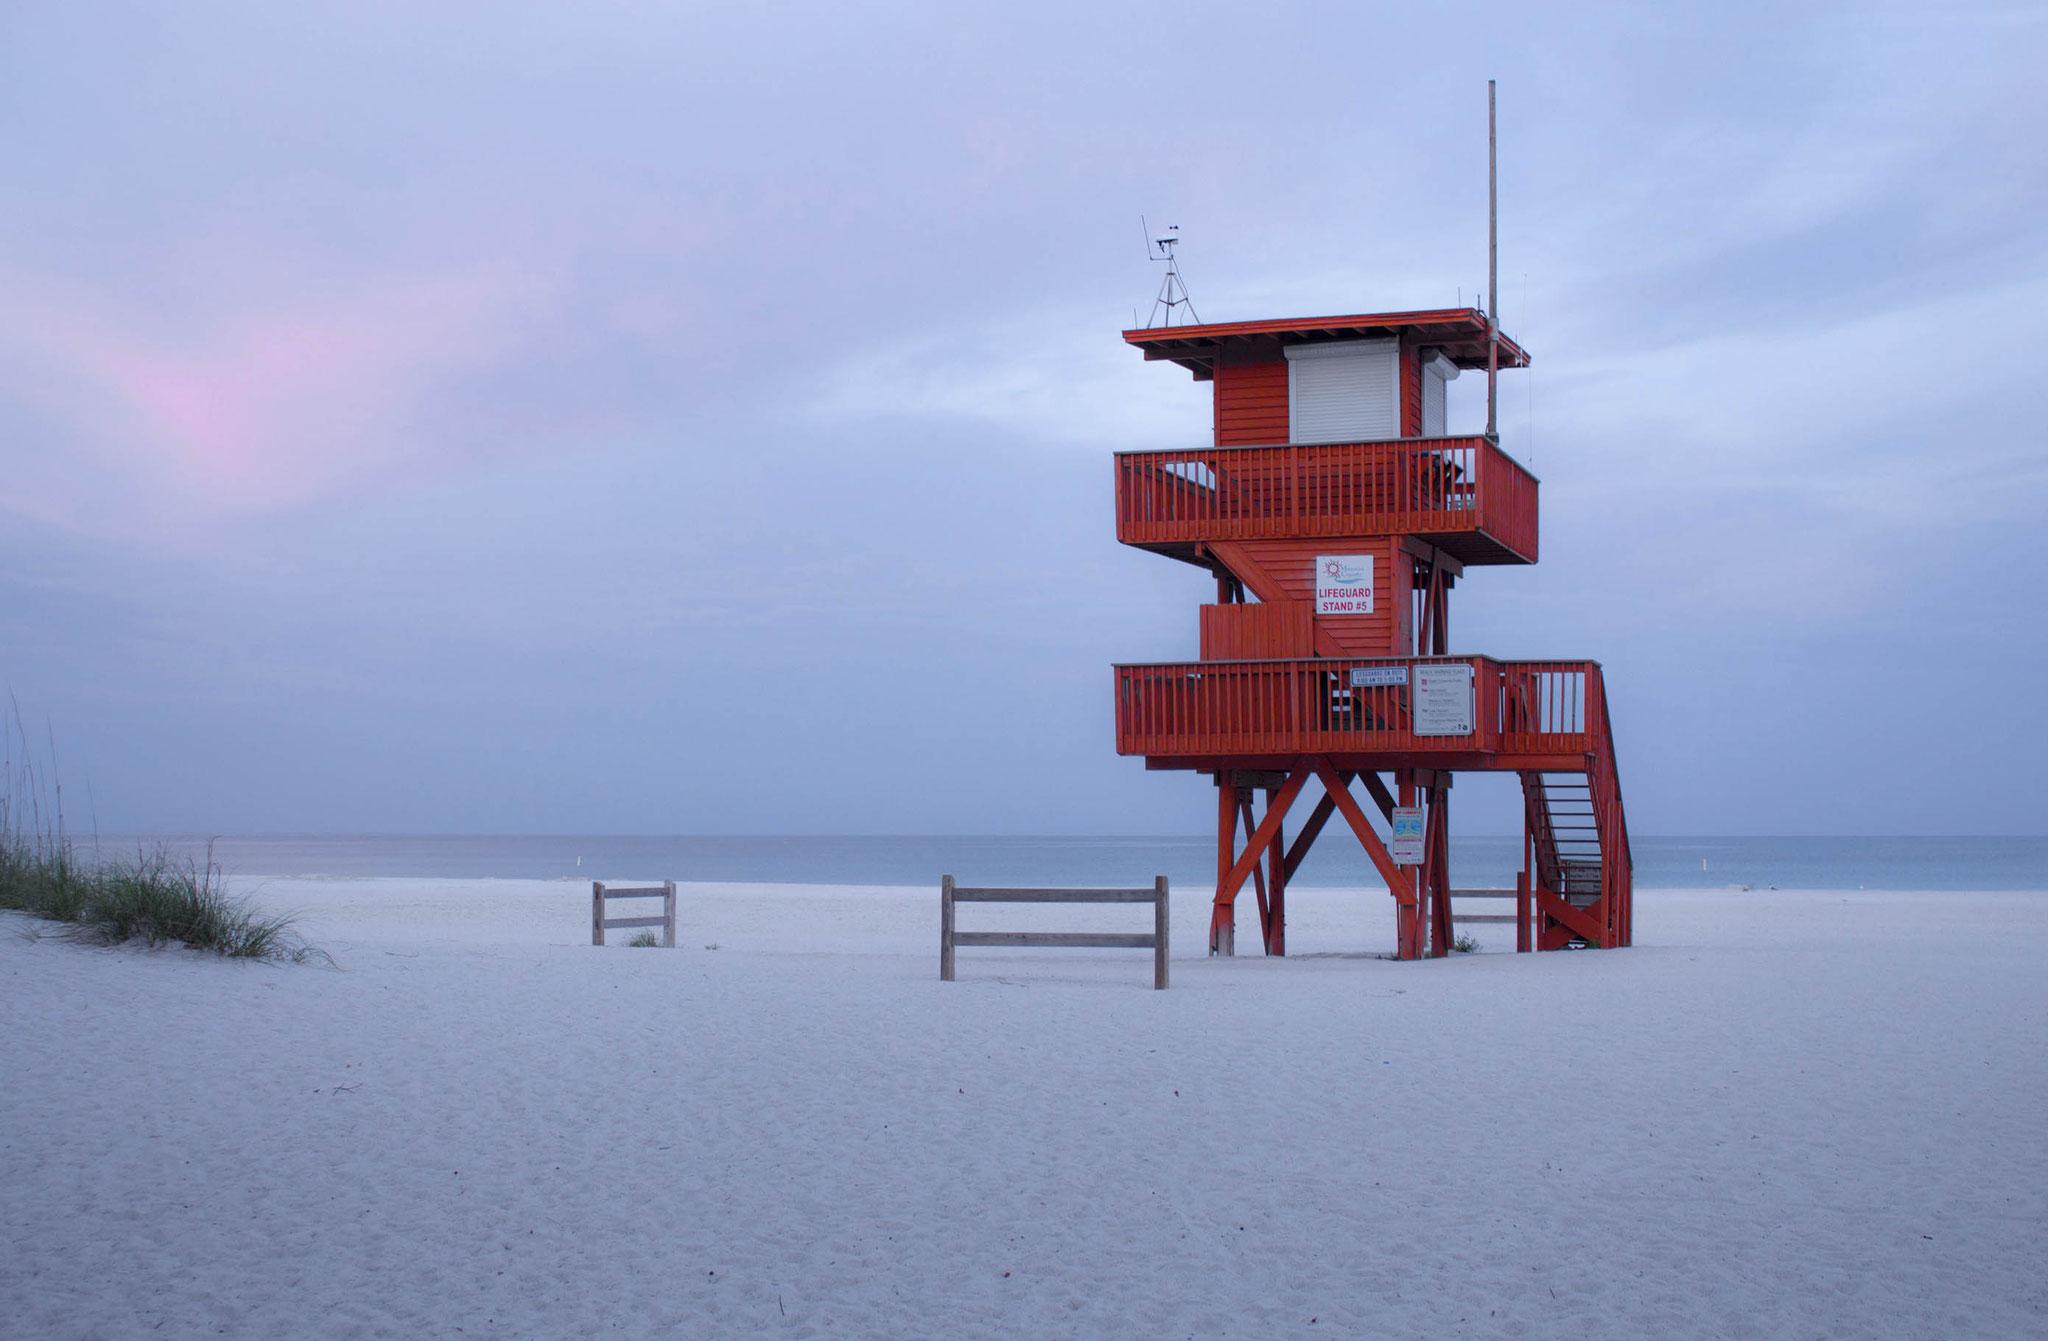 14 - Philippe GOMIS - Saratoga beach - Floride